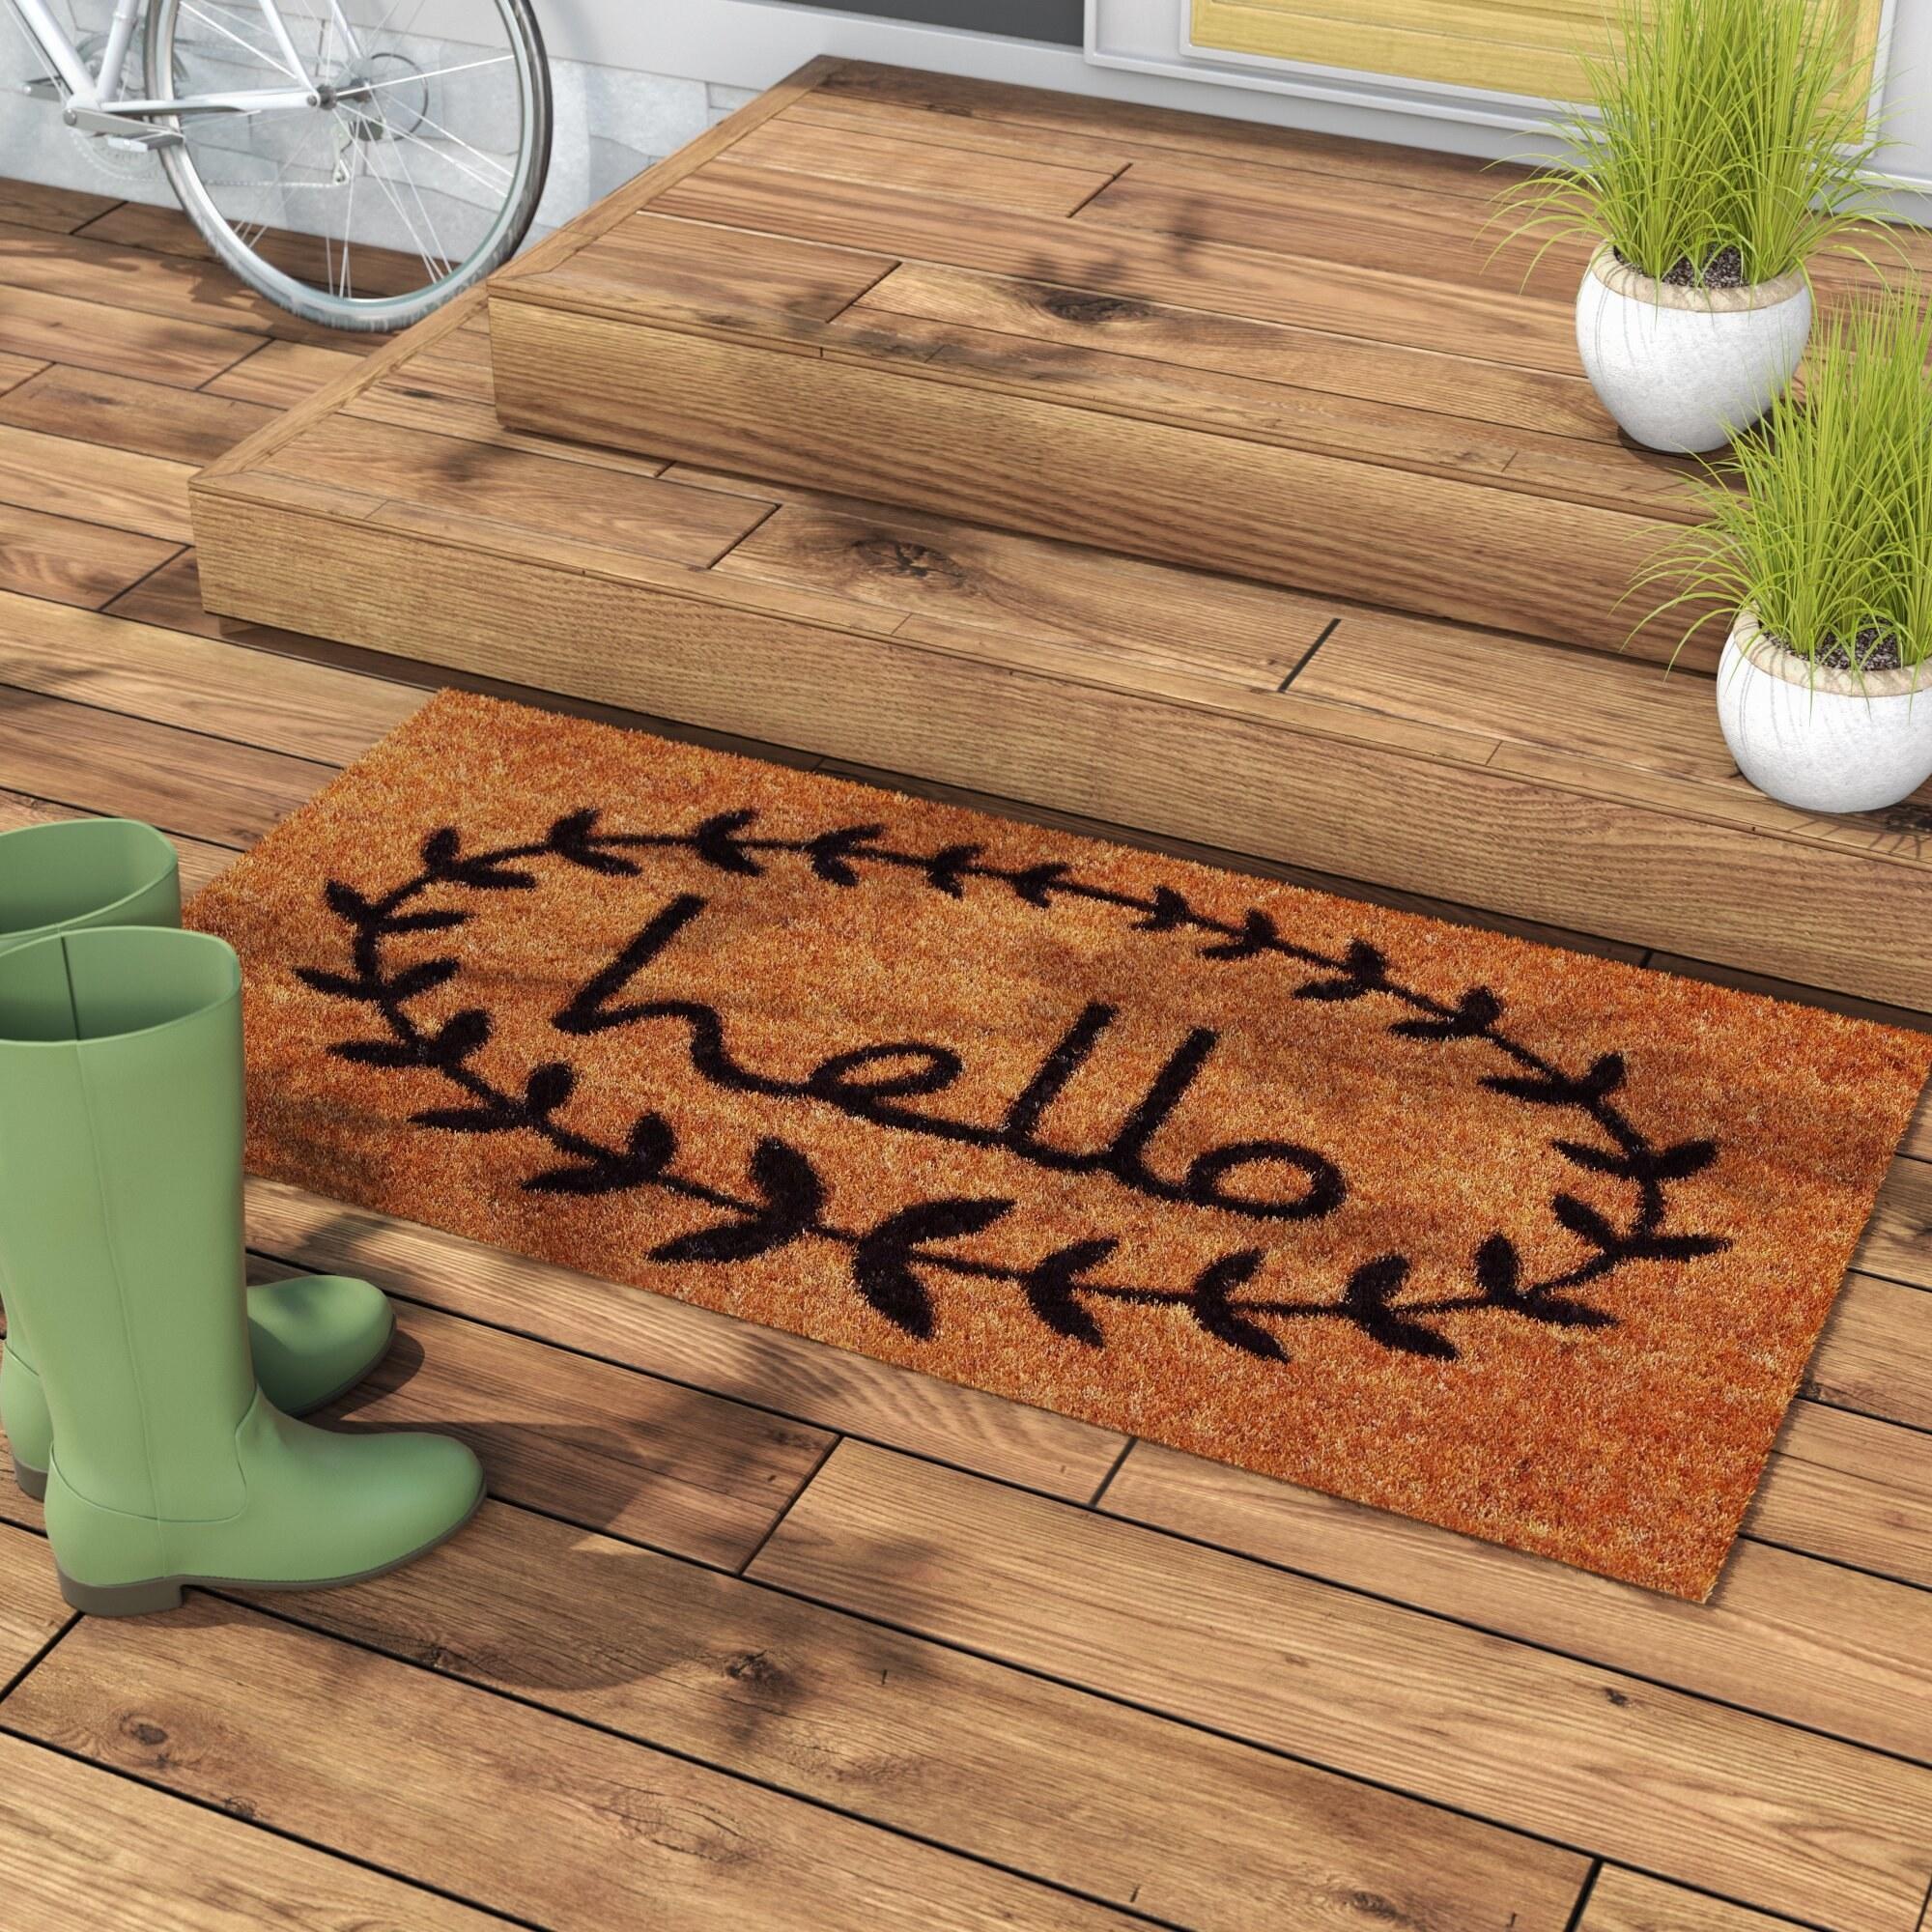 Outdoor mat on porch